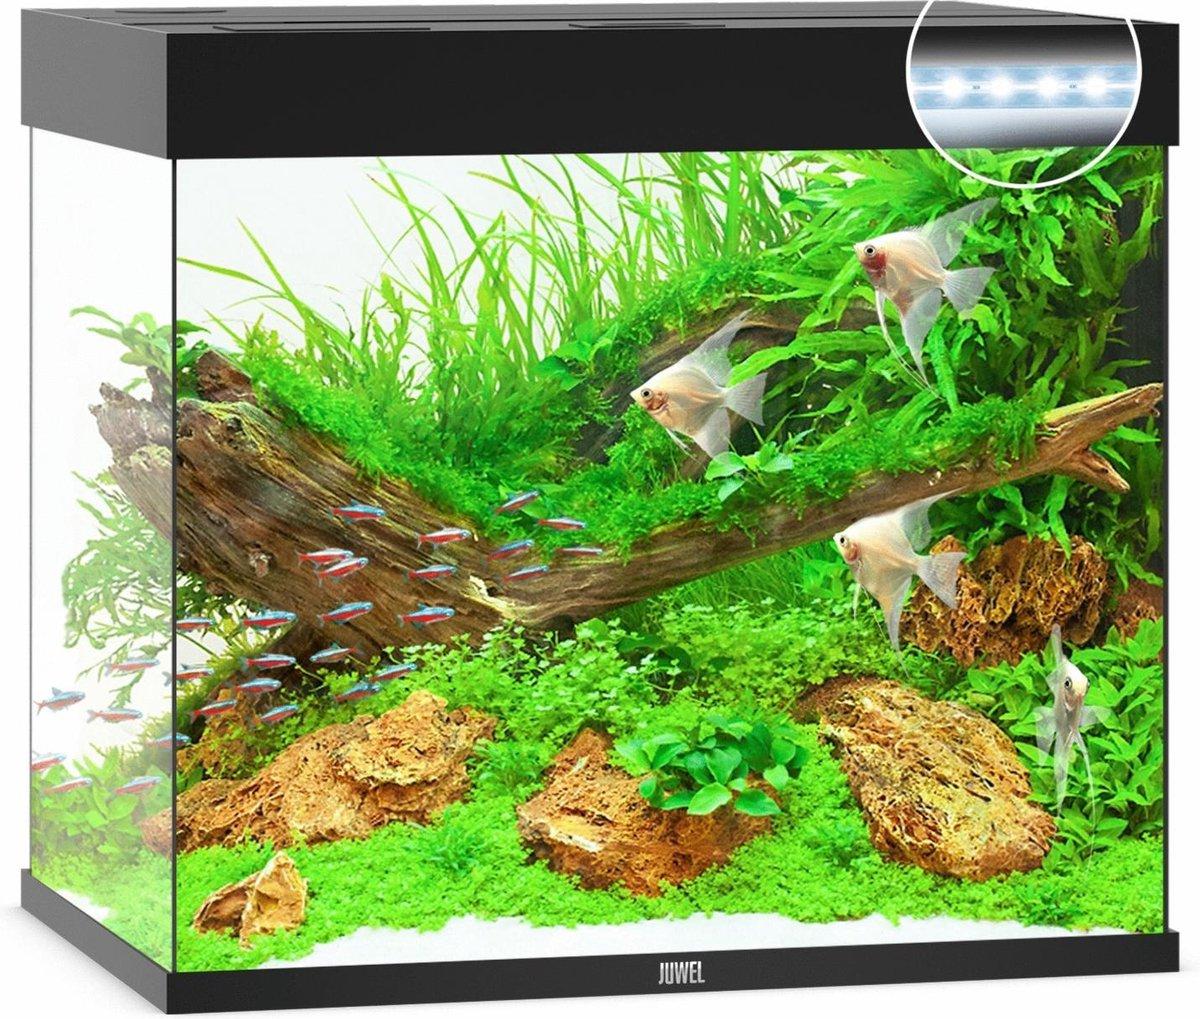 Juwel Lido 200 LED Aquarium - Zwart - 200L - 71 x 51 x 65 cm - Juwel